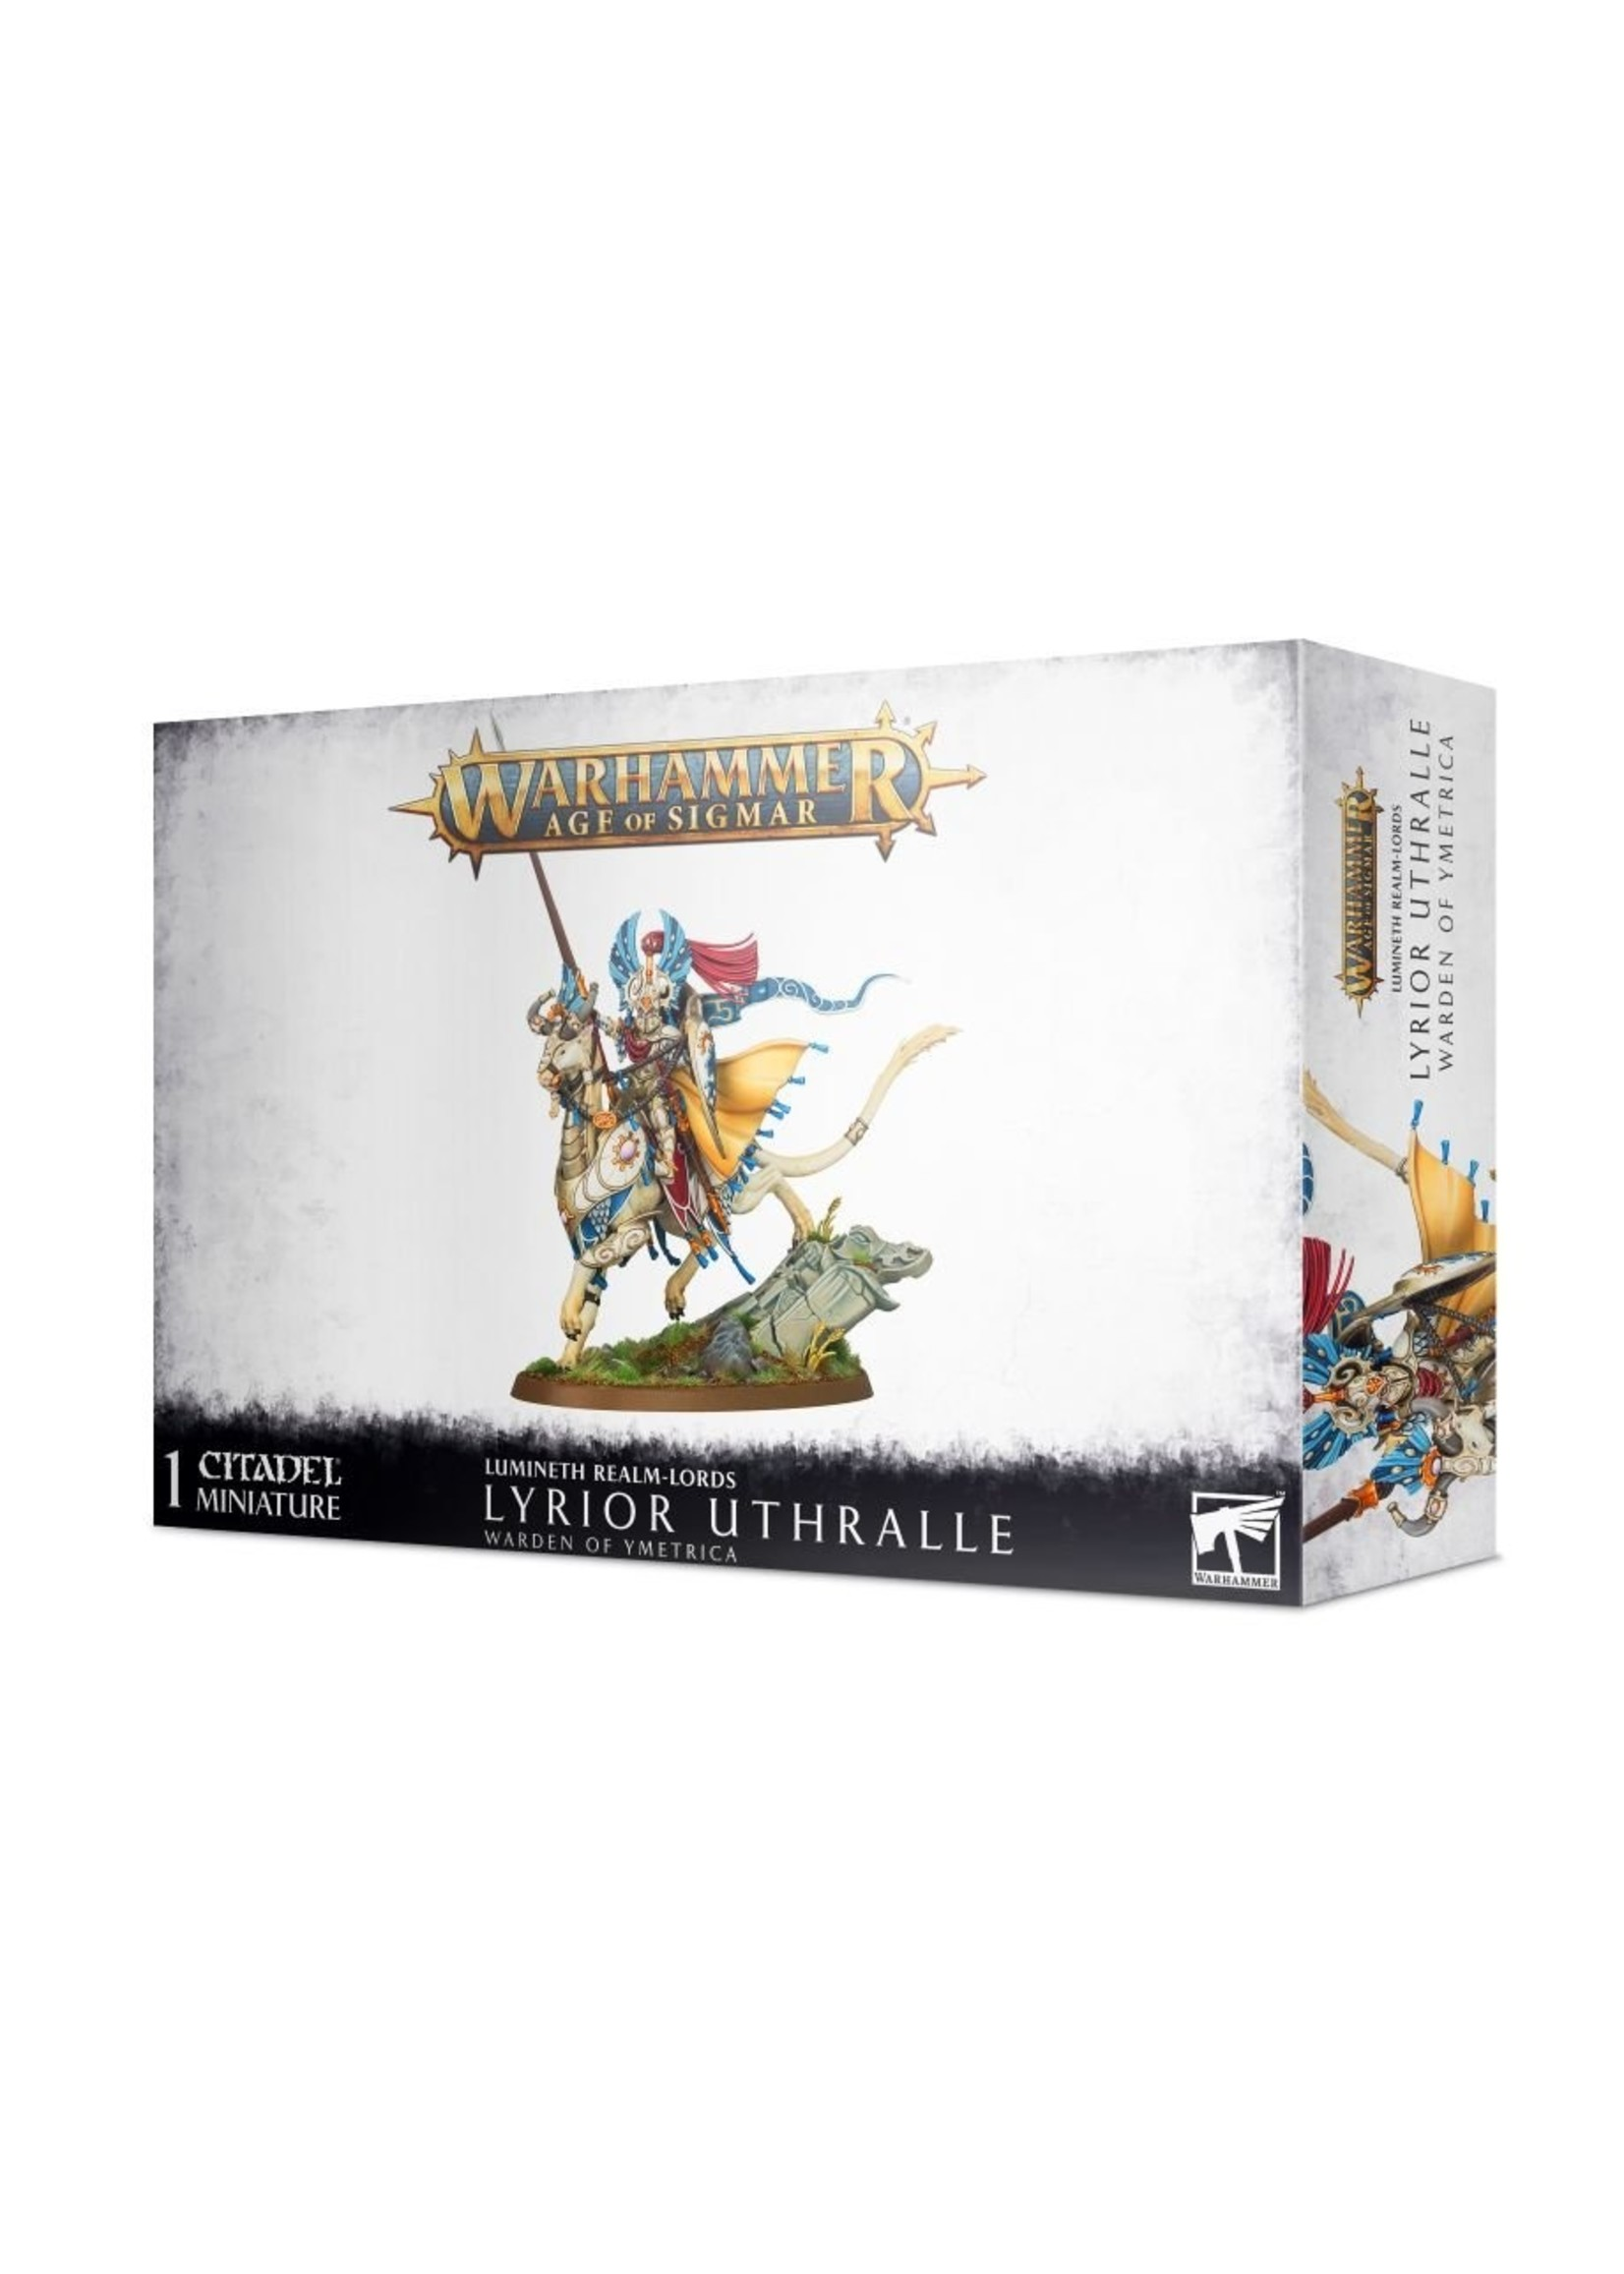 Warhammer Age of Sigmar: Lumineth Realm-Lords Lyrior Uthralle Warden of Ymetrica